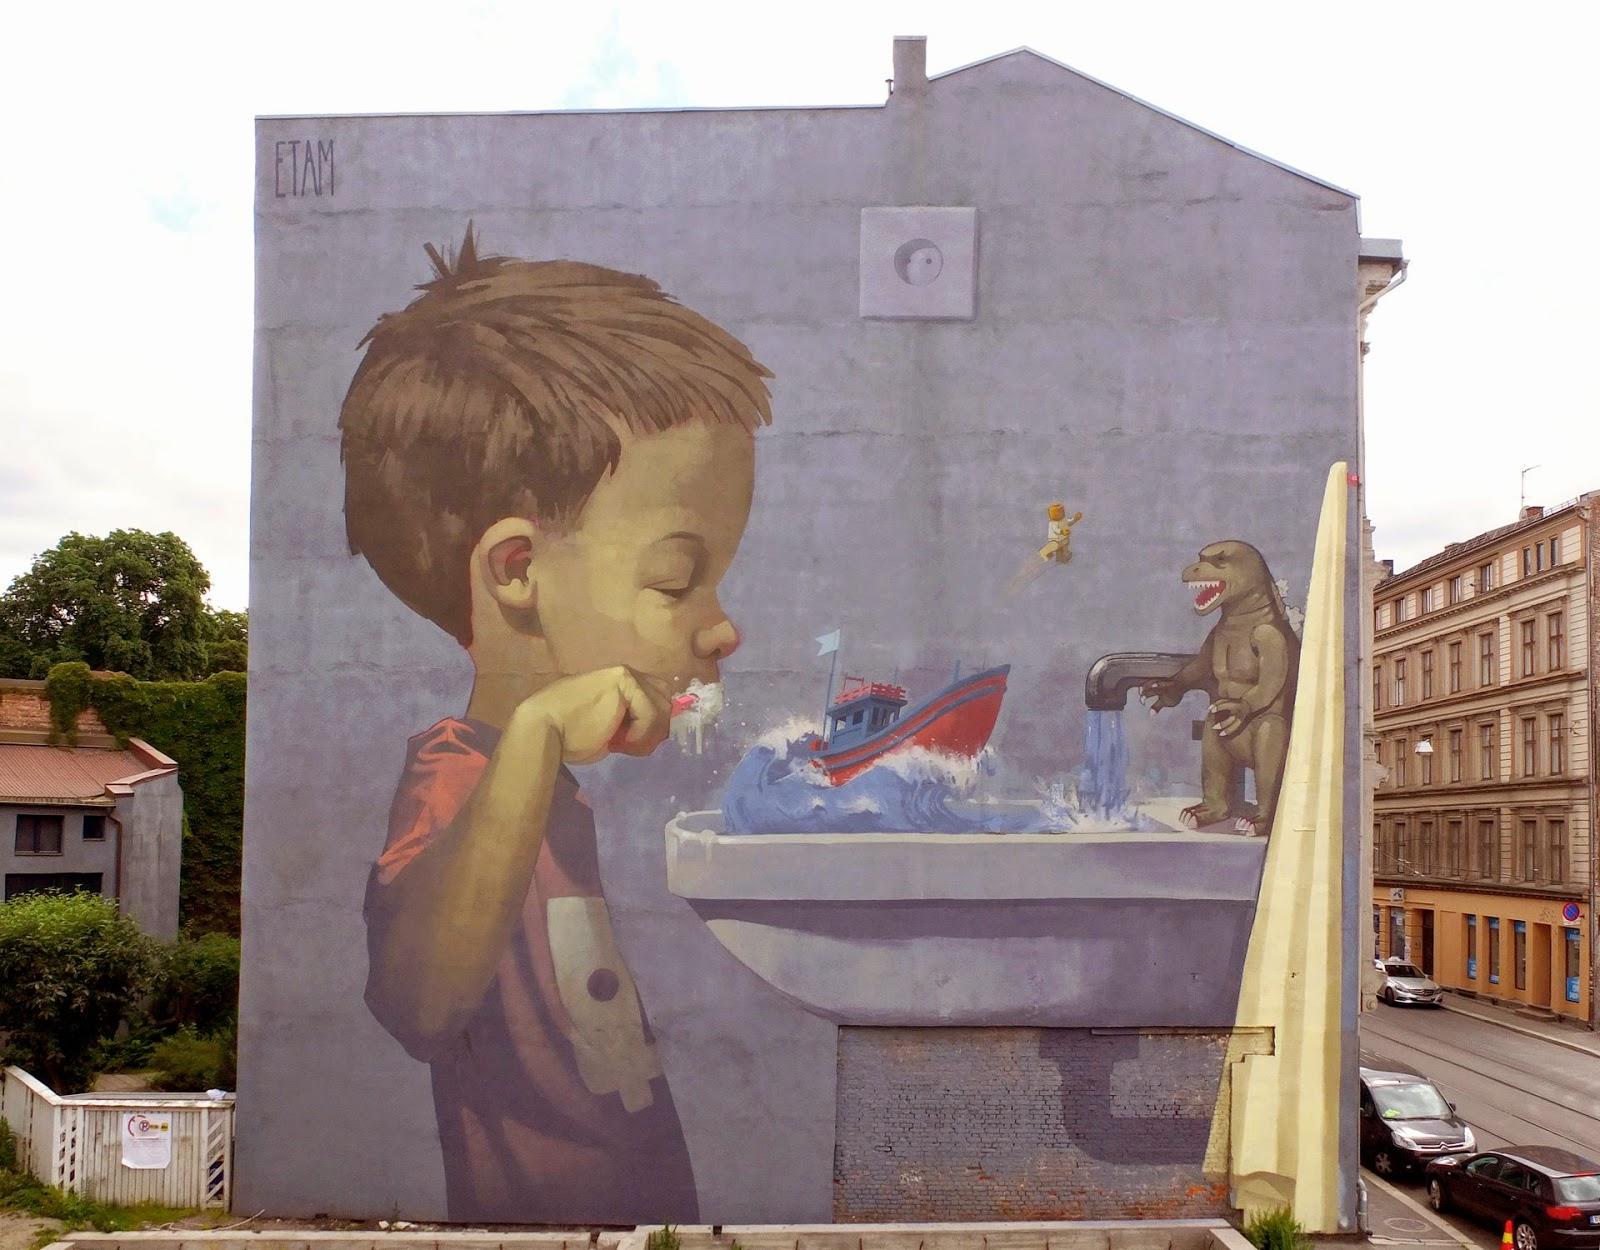 Etam Cru New Mural – Oslo, Norway